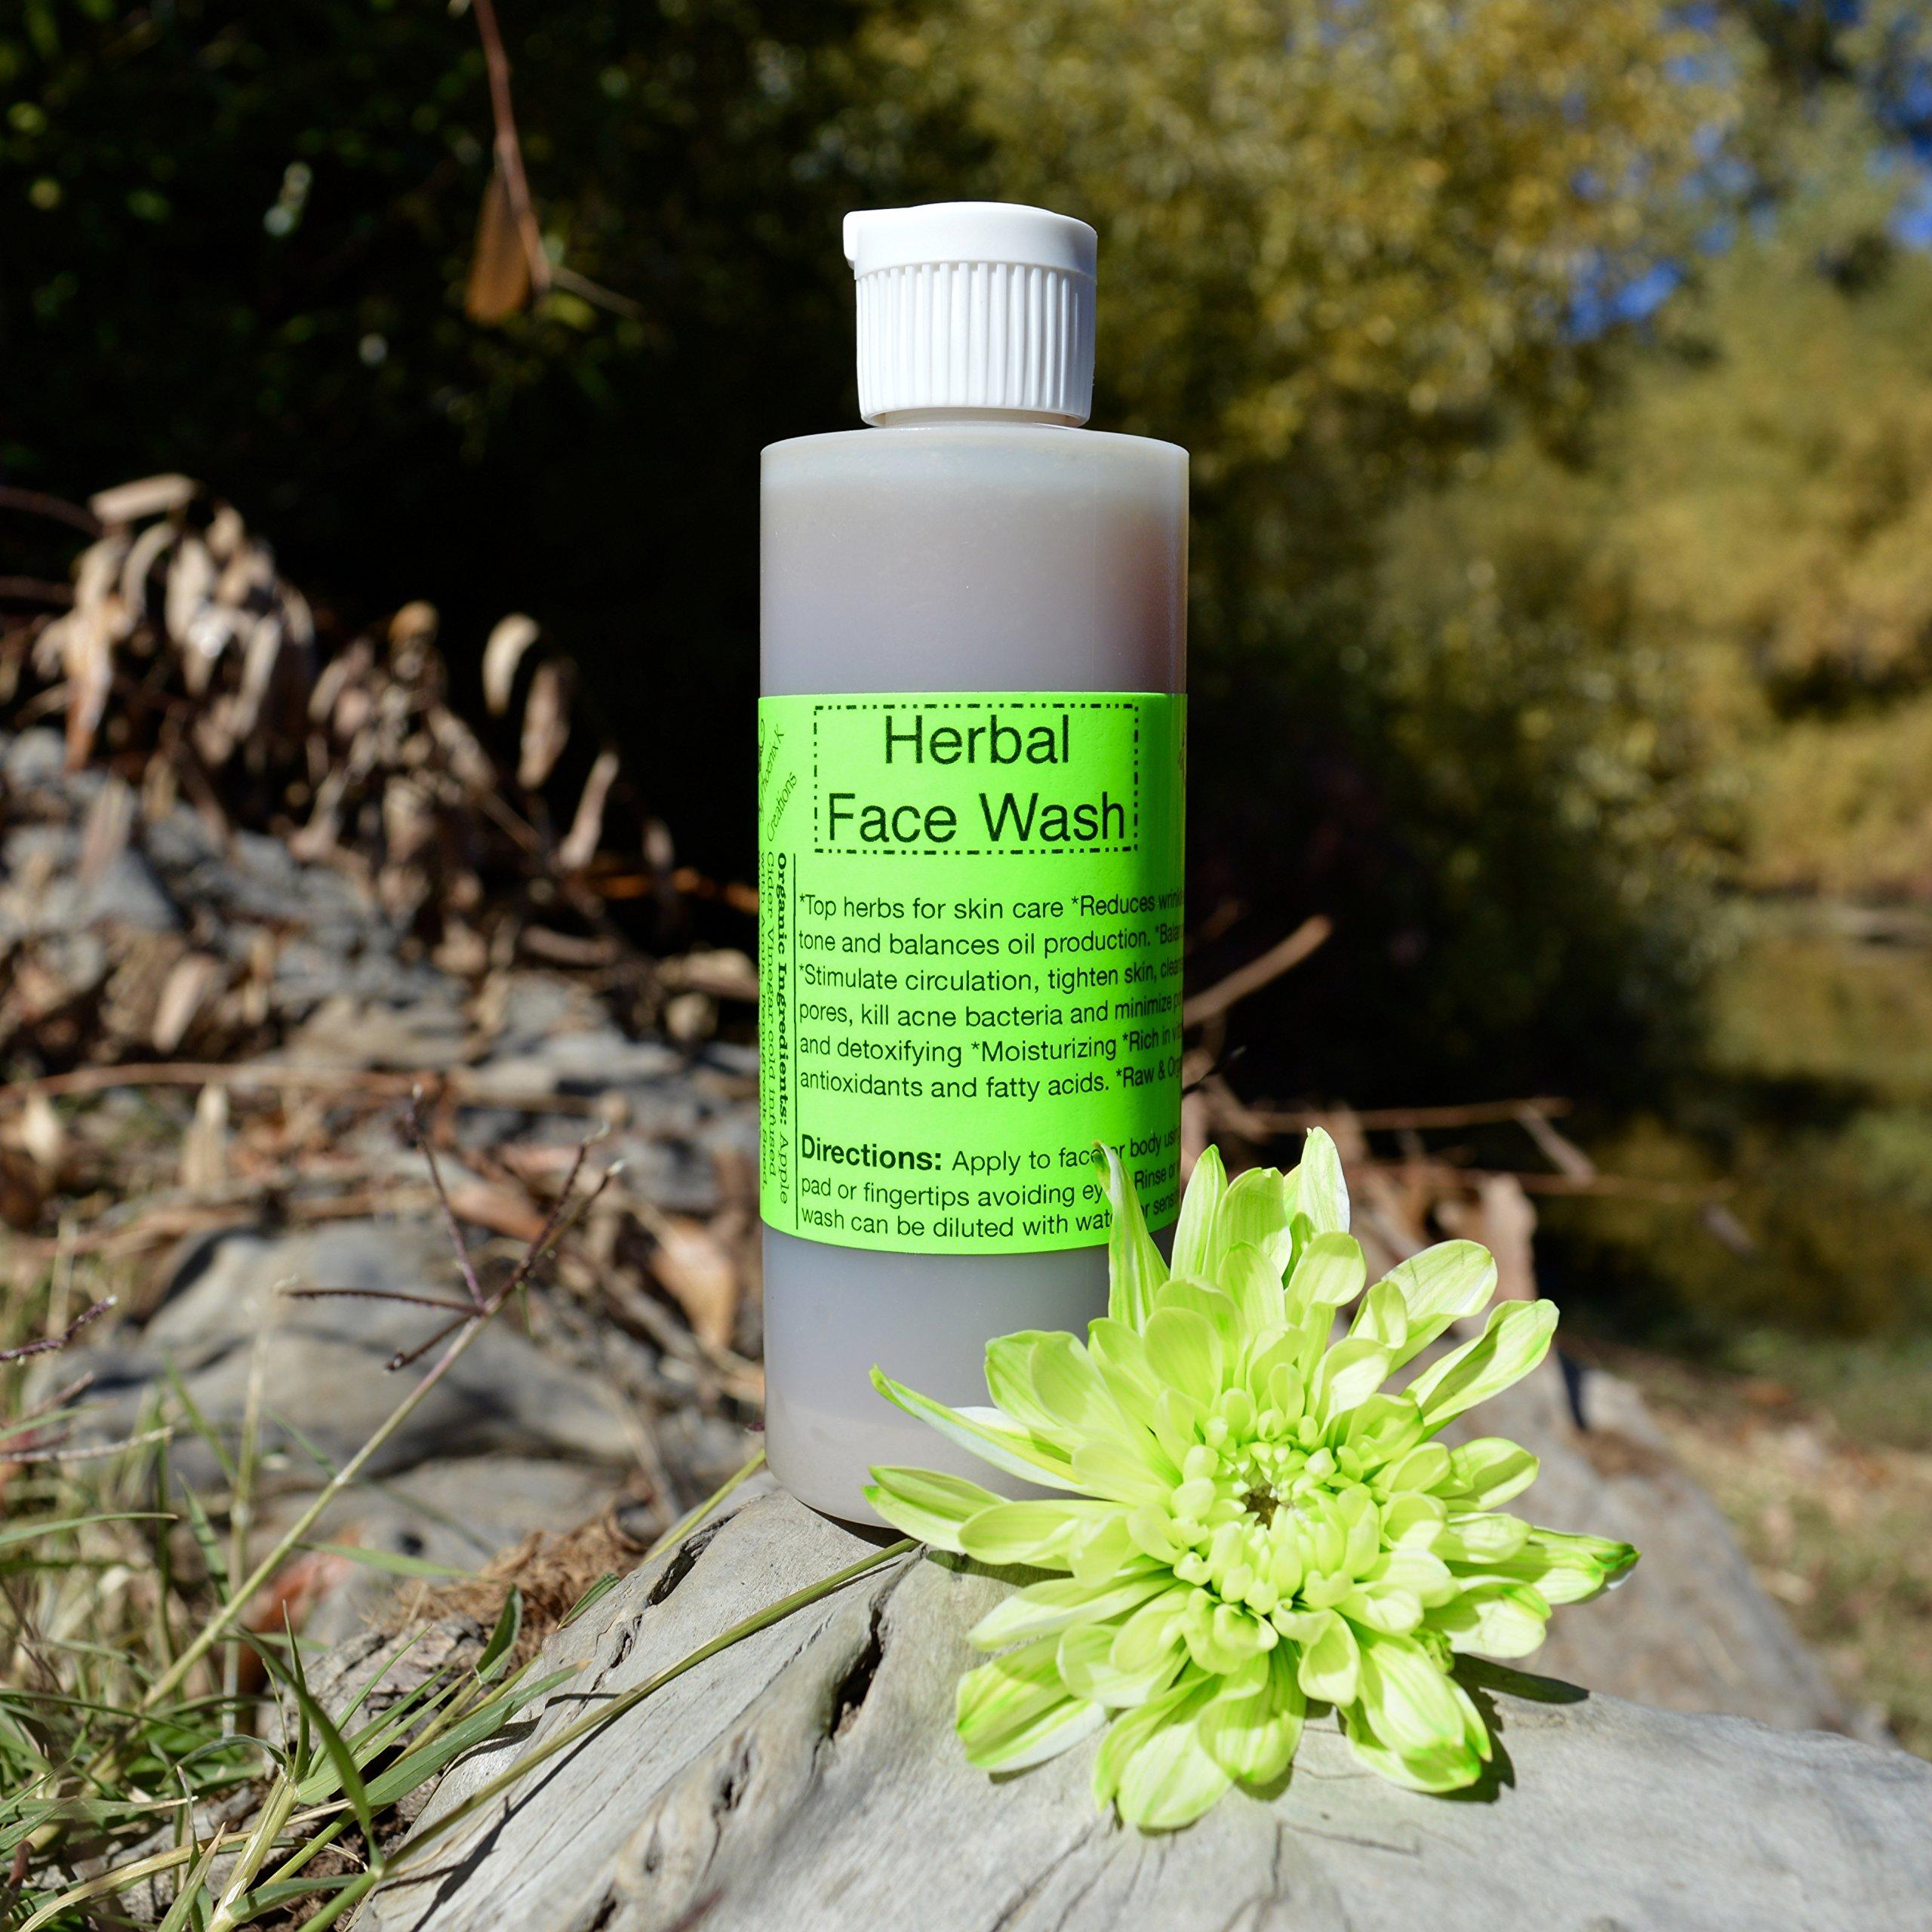 Herbal Face Wash- 4 Oz- Raw, Vegan, Organic, pH Balancing, free of harsh soaps and detergents, sensitive skin safe, balances oil production